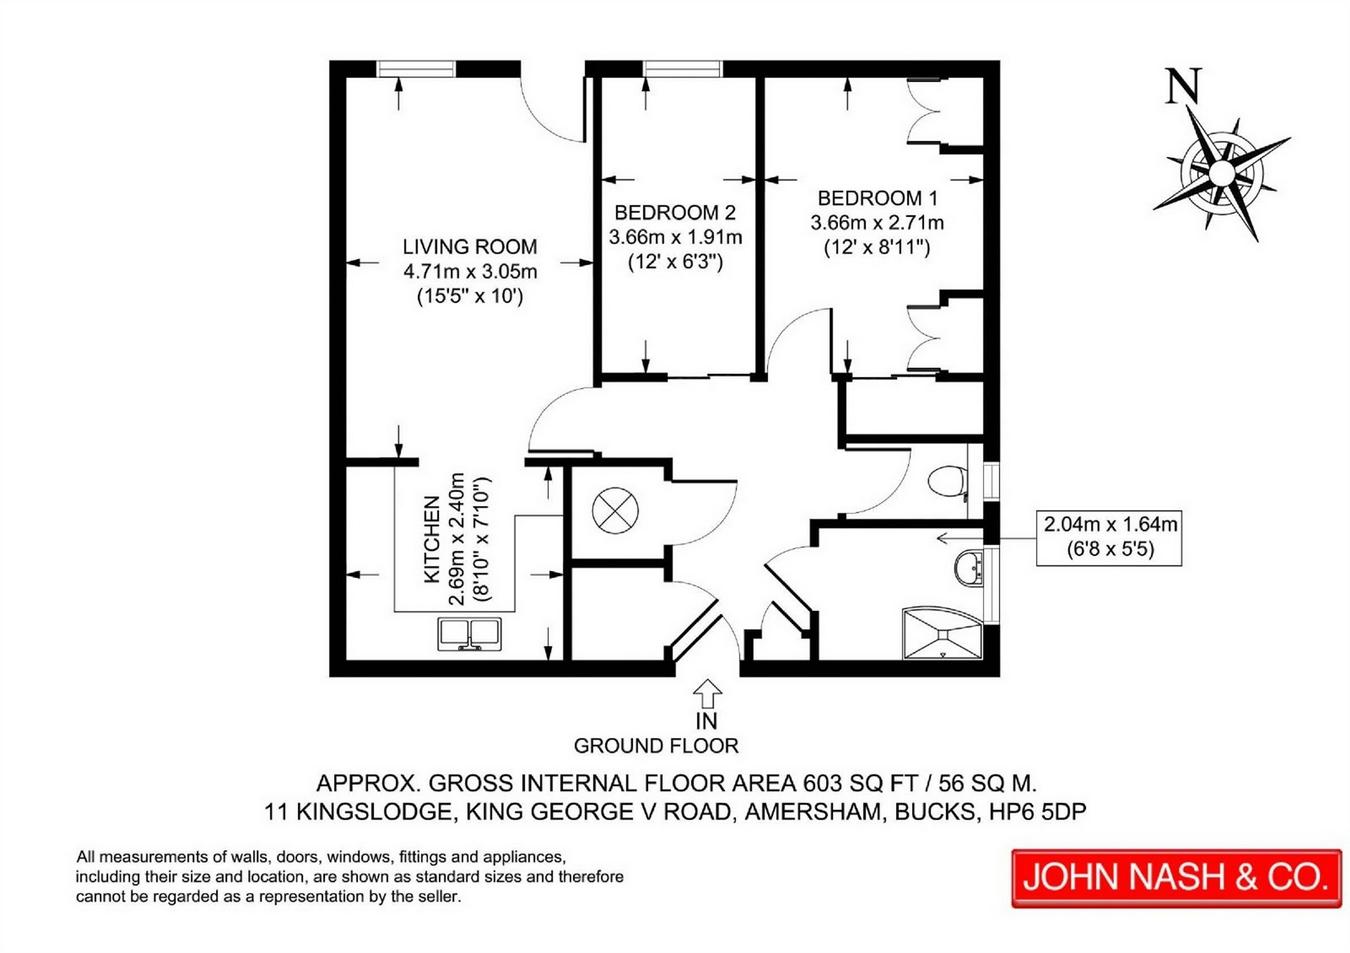 2 Bed Property For Sale In King George V Road Amersham